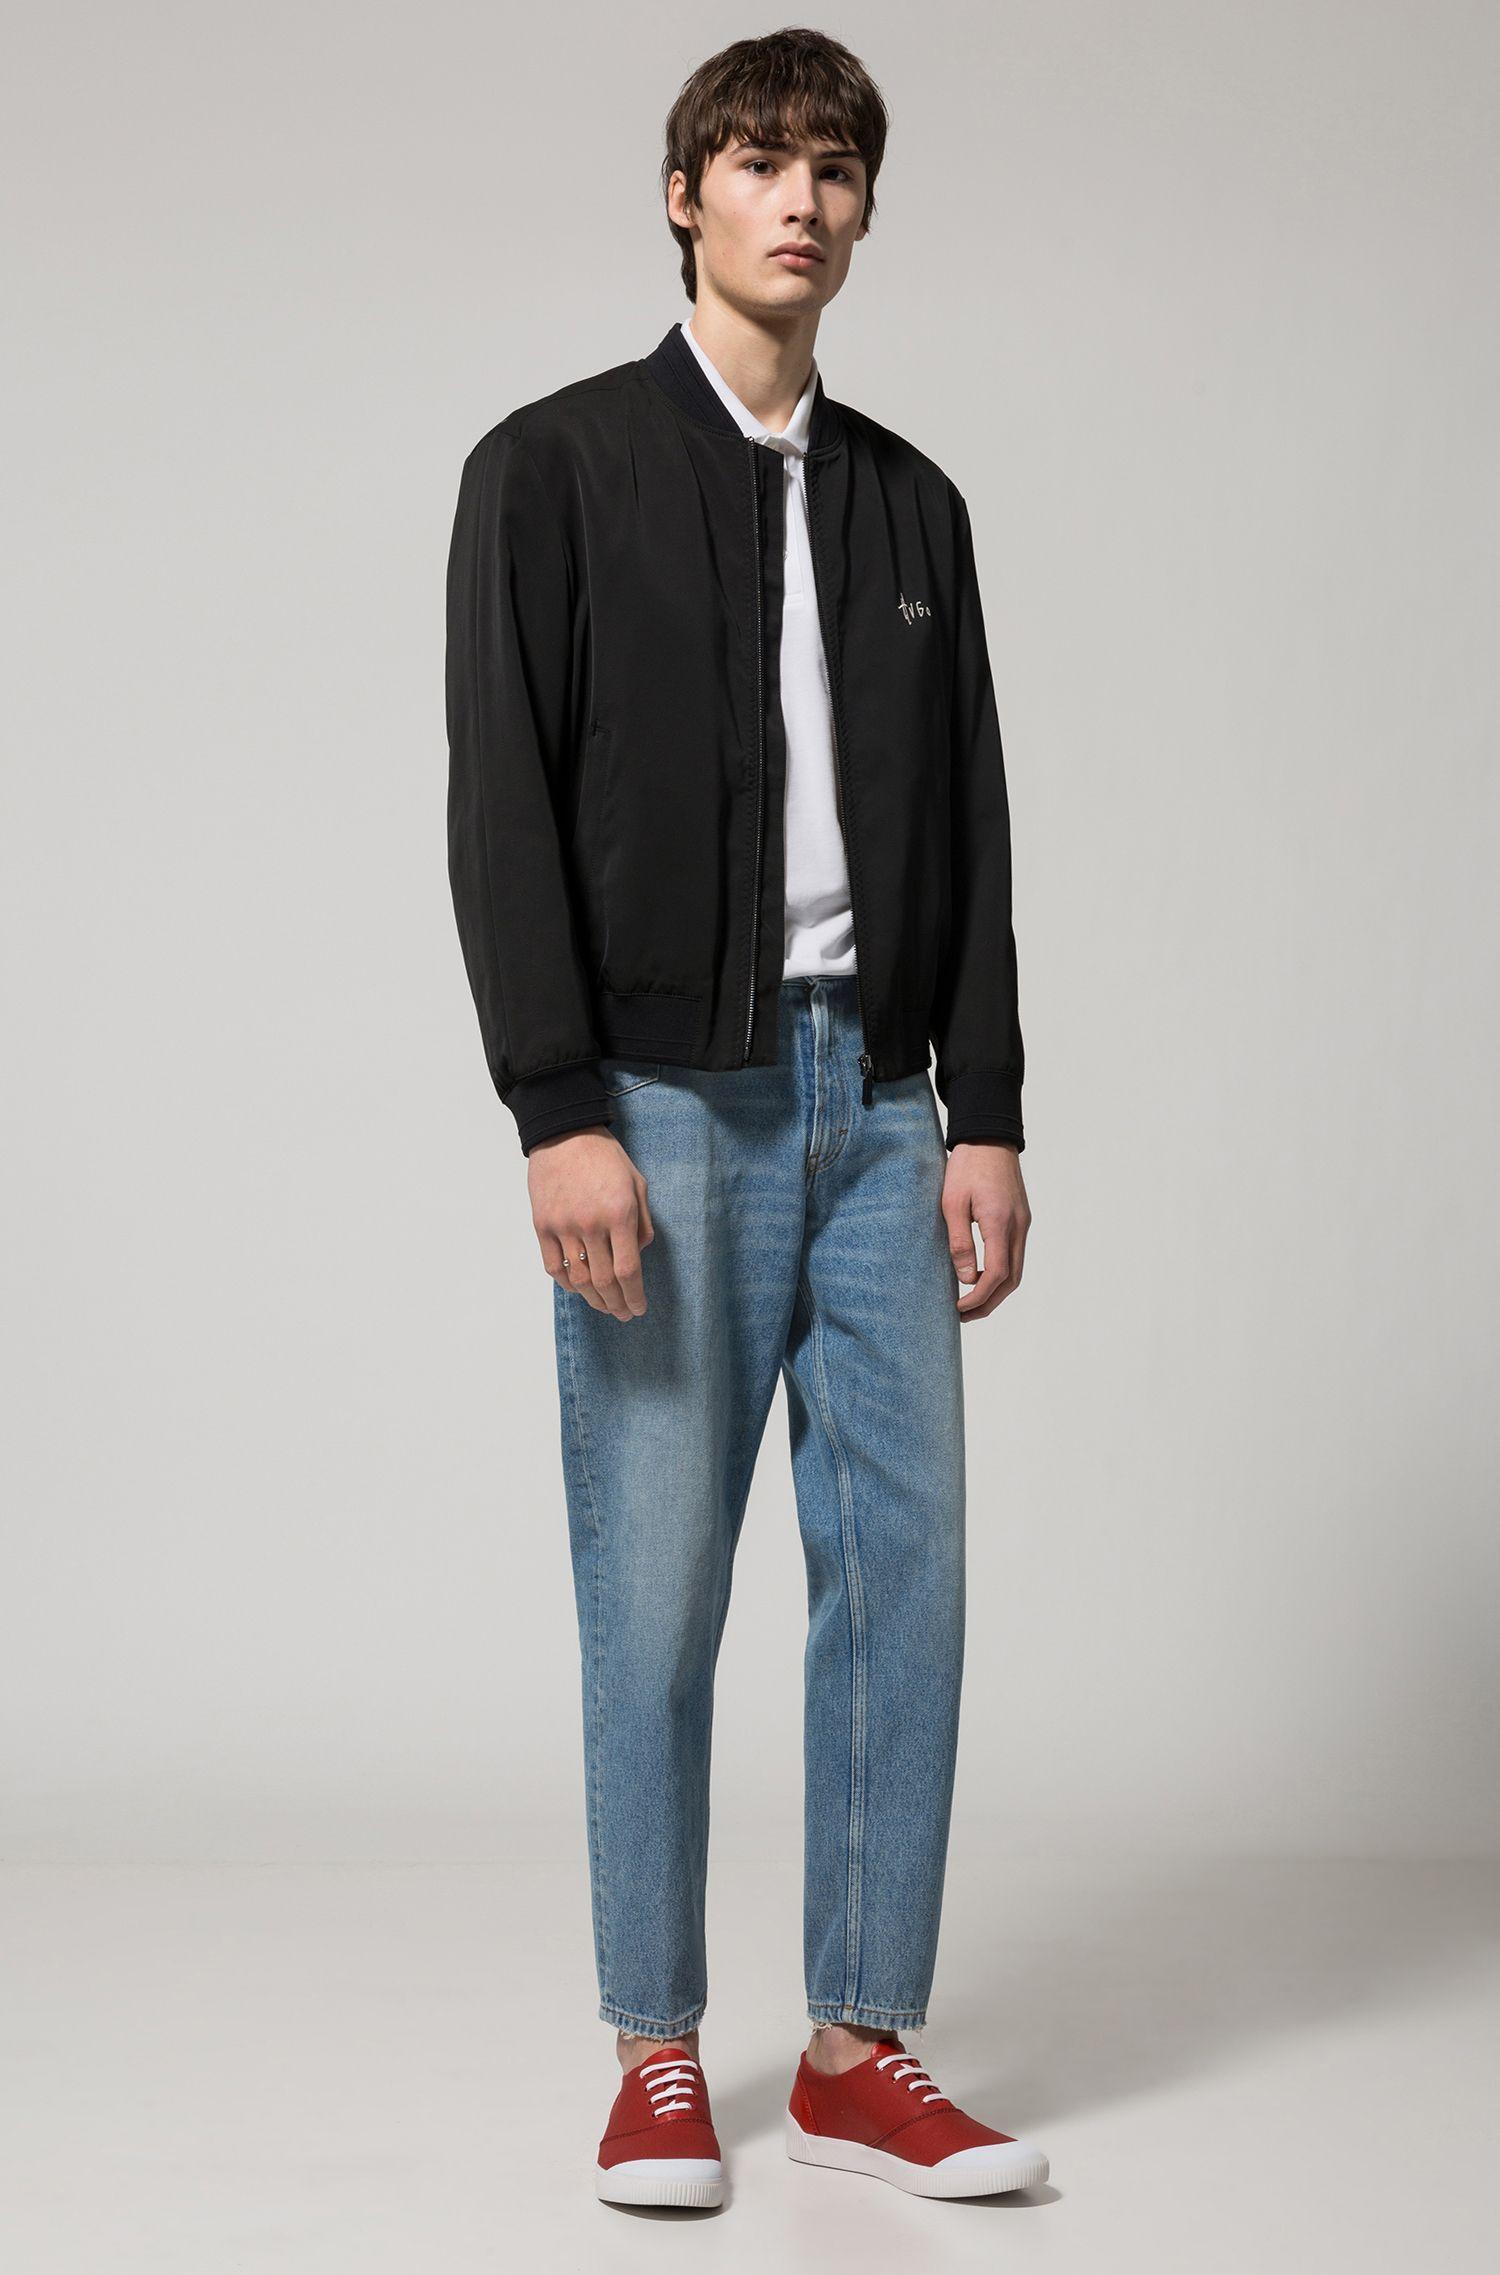 Graphic-Print Polo Shirt, Regular Fit | Darelli, White